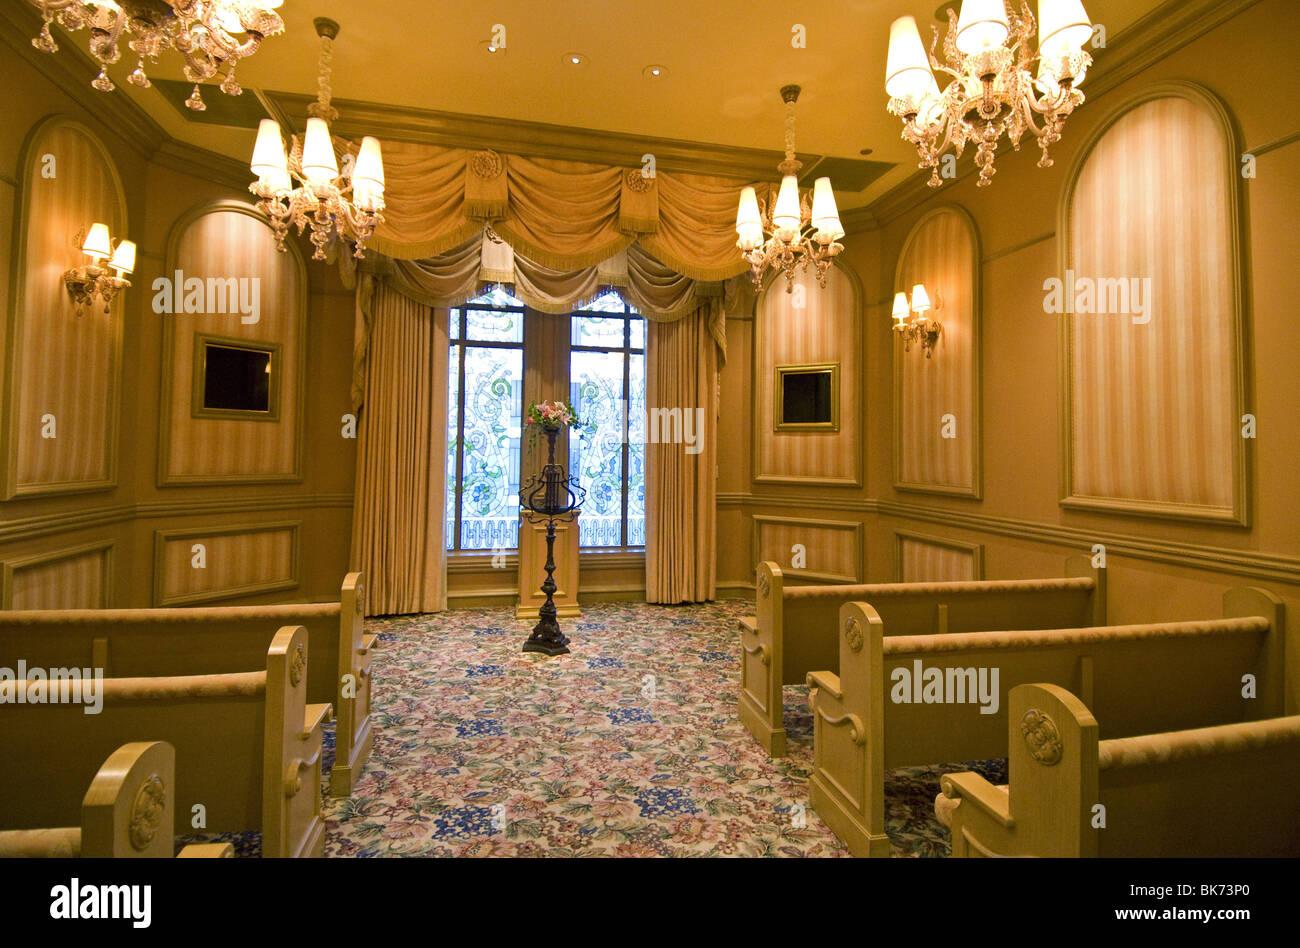 Wedding Chapel Hotel Bellagio Las Vegas Stock Photo 29045464 Alamy